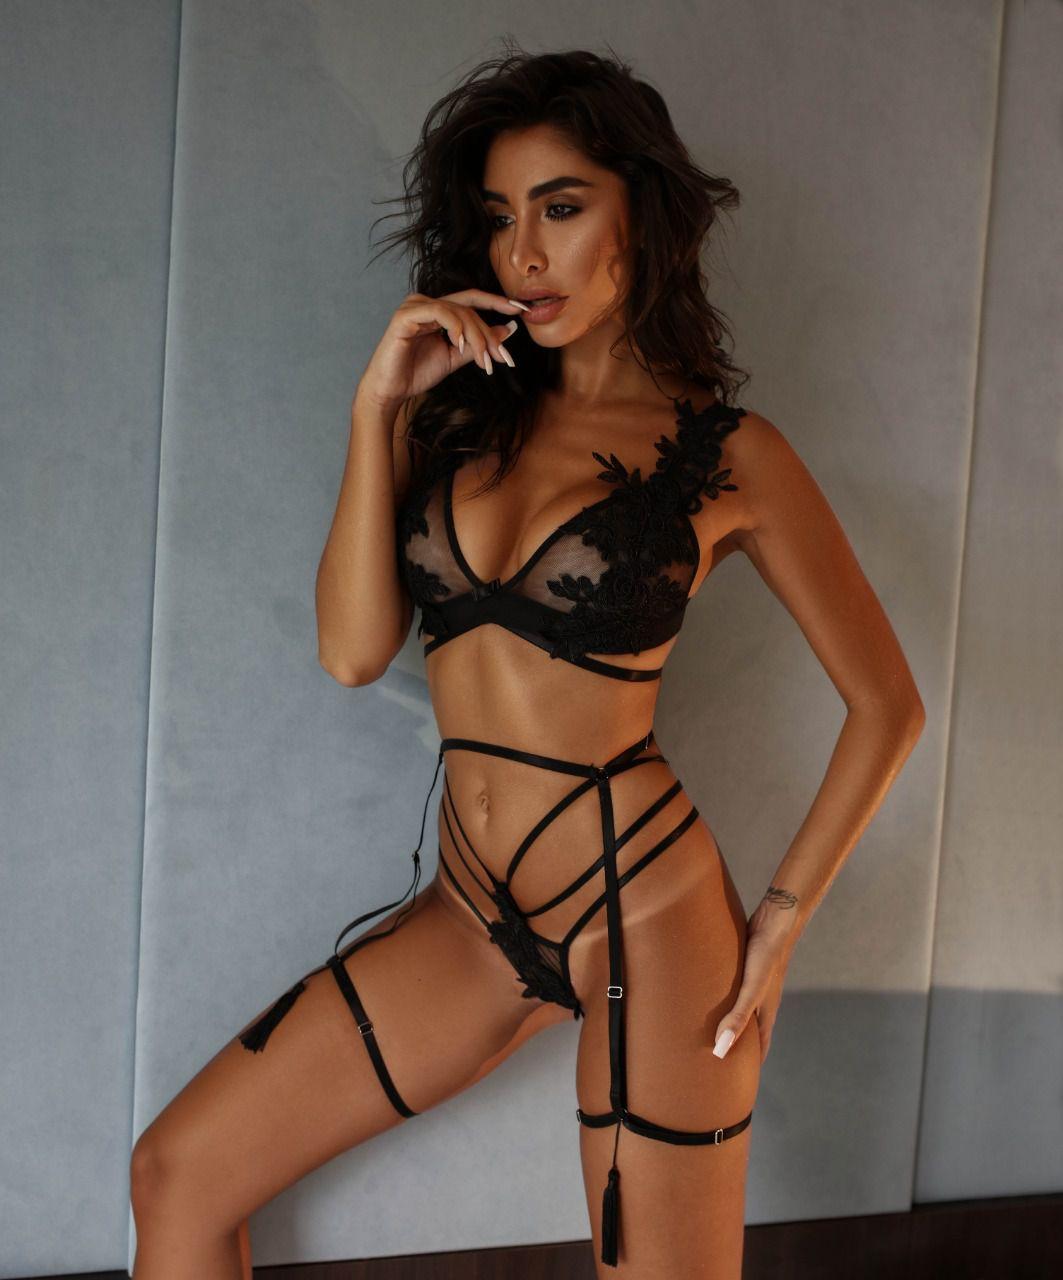 Conjunto Sensual Maria Antonieta Preto com Cinta Fetiche - Lingerie Segredo Lacrado